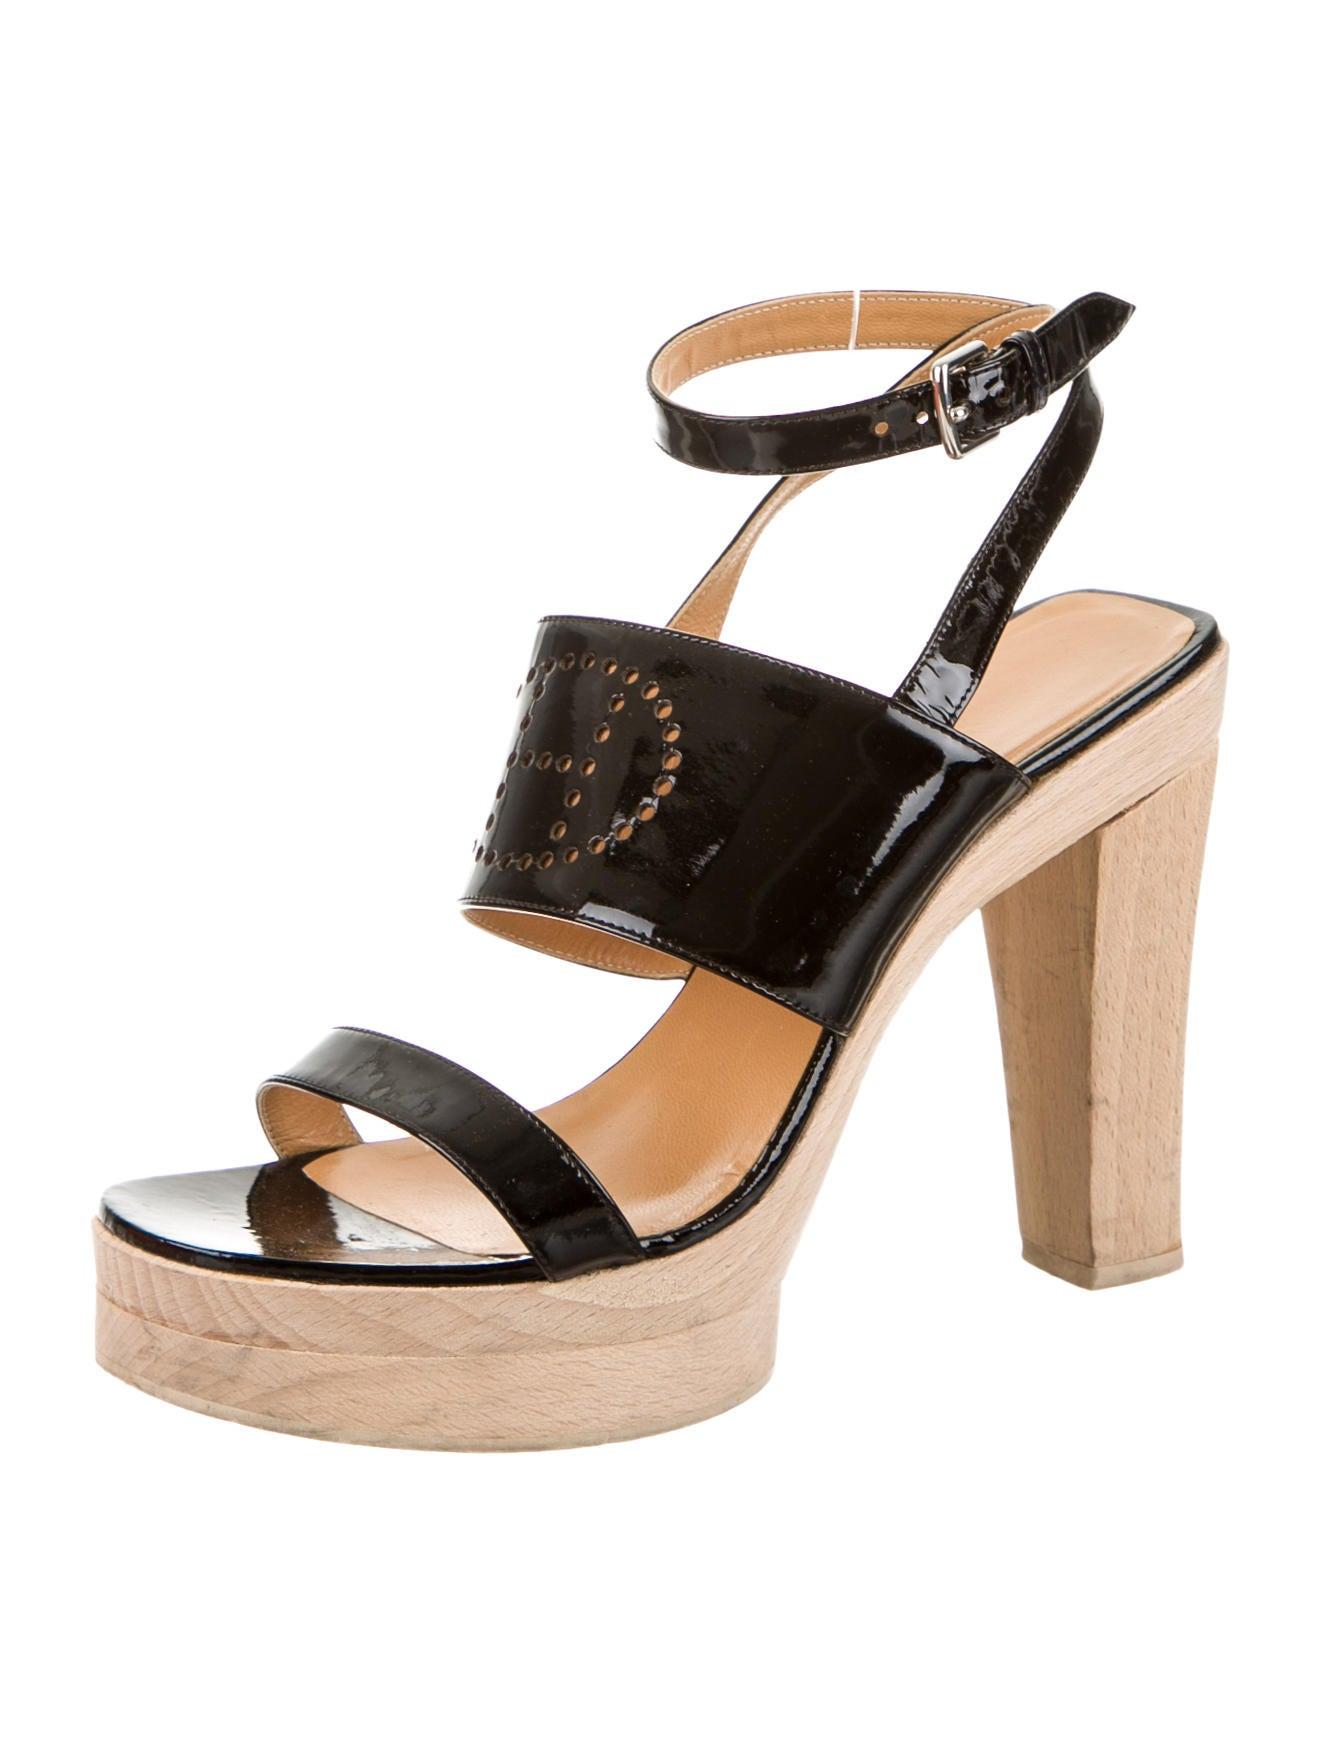 hermes women shoes - photo #11